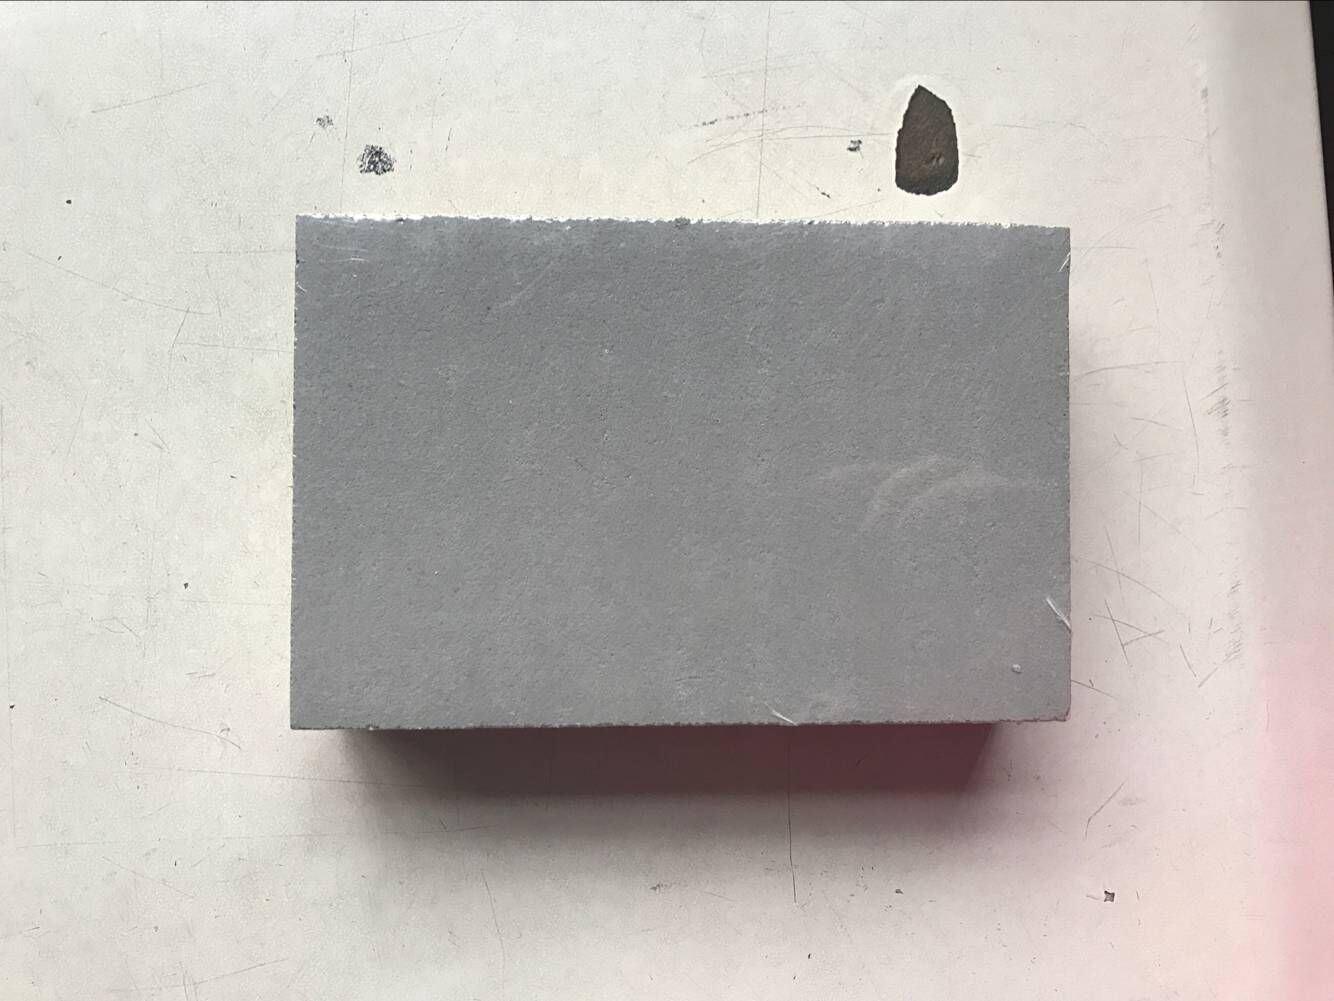 Gypsum Film with Coated Tissue